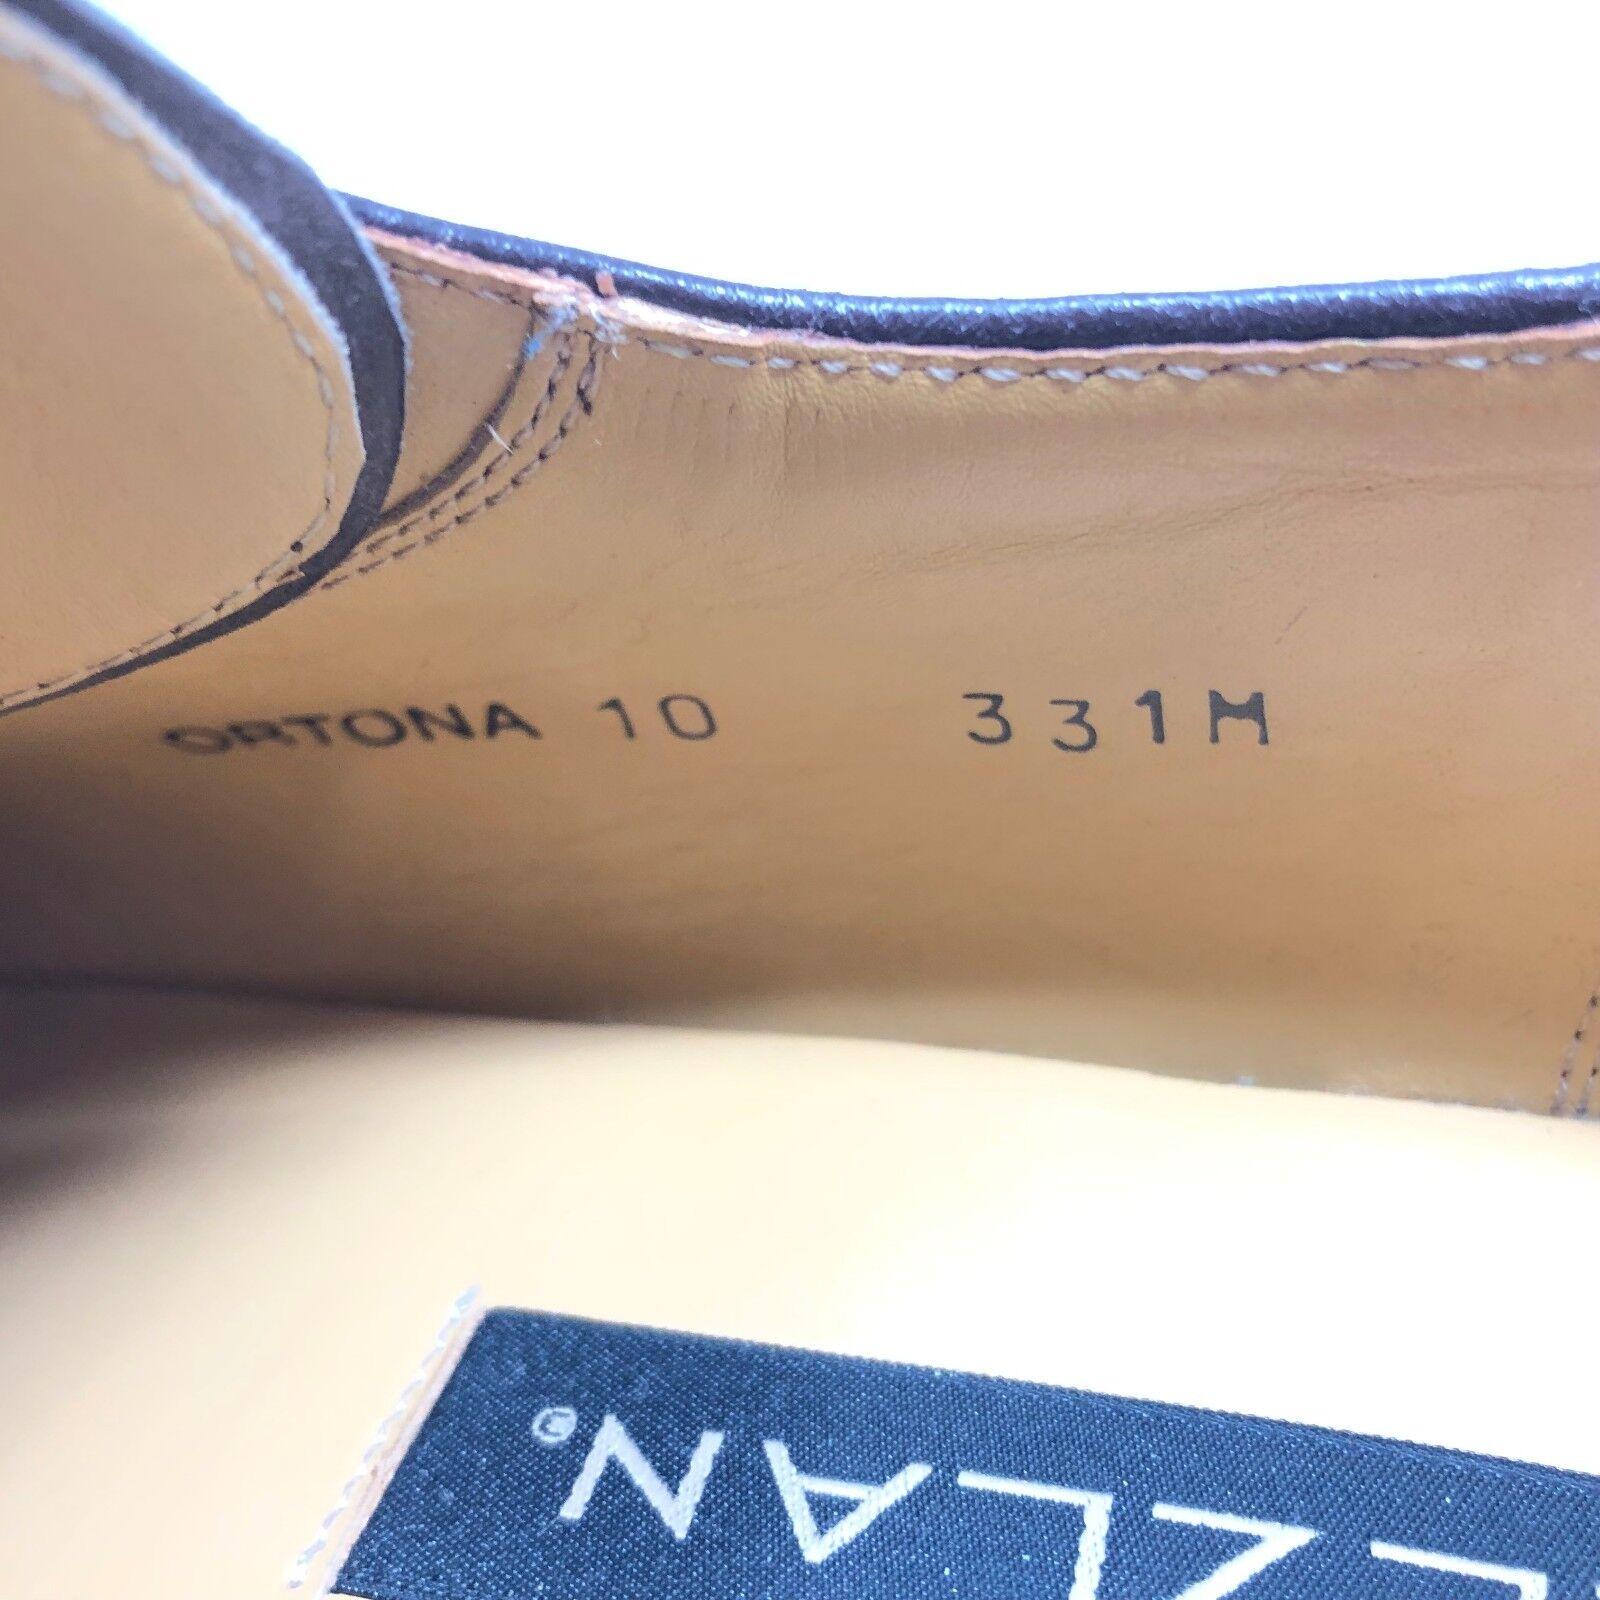 Mezlan ORTONA Oxford Oxford Oxford braun Suede Leather Square Toe Casual schuhe Mens Größe 10 587a01